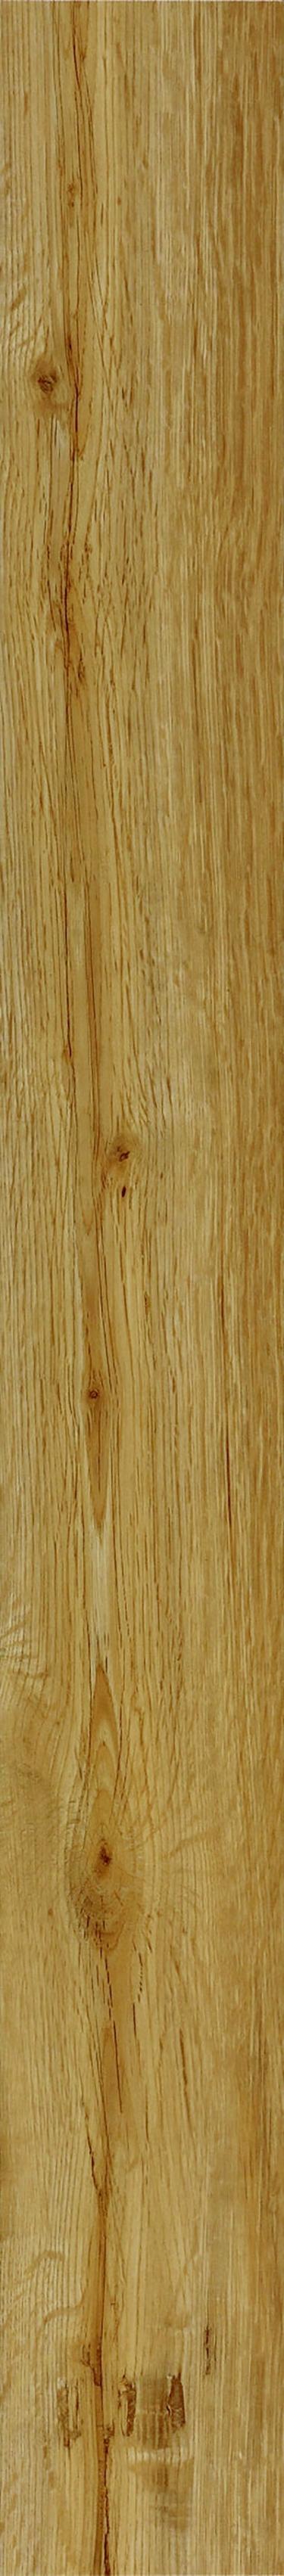 Vinylové podlahy Gerflor DESIGNART Home Rigid Hobart